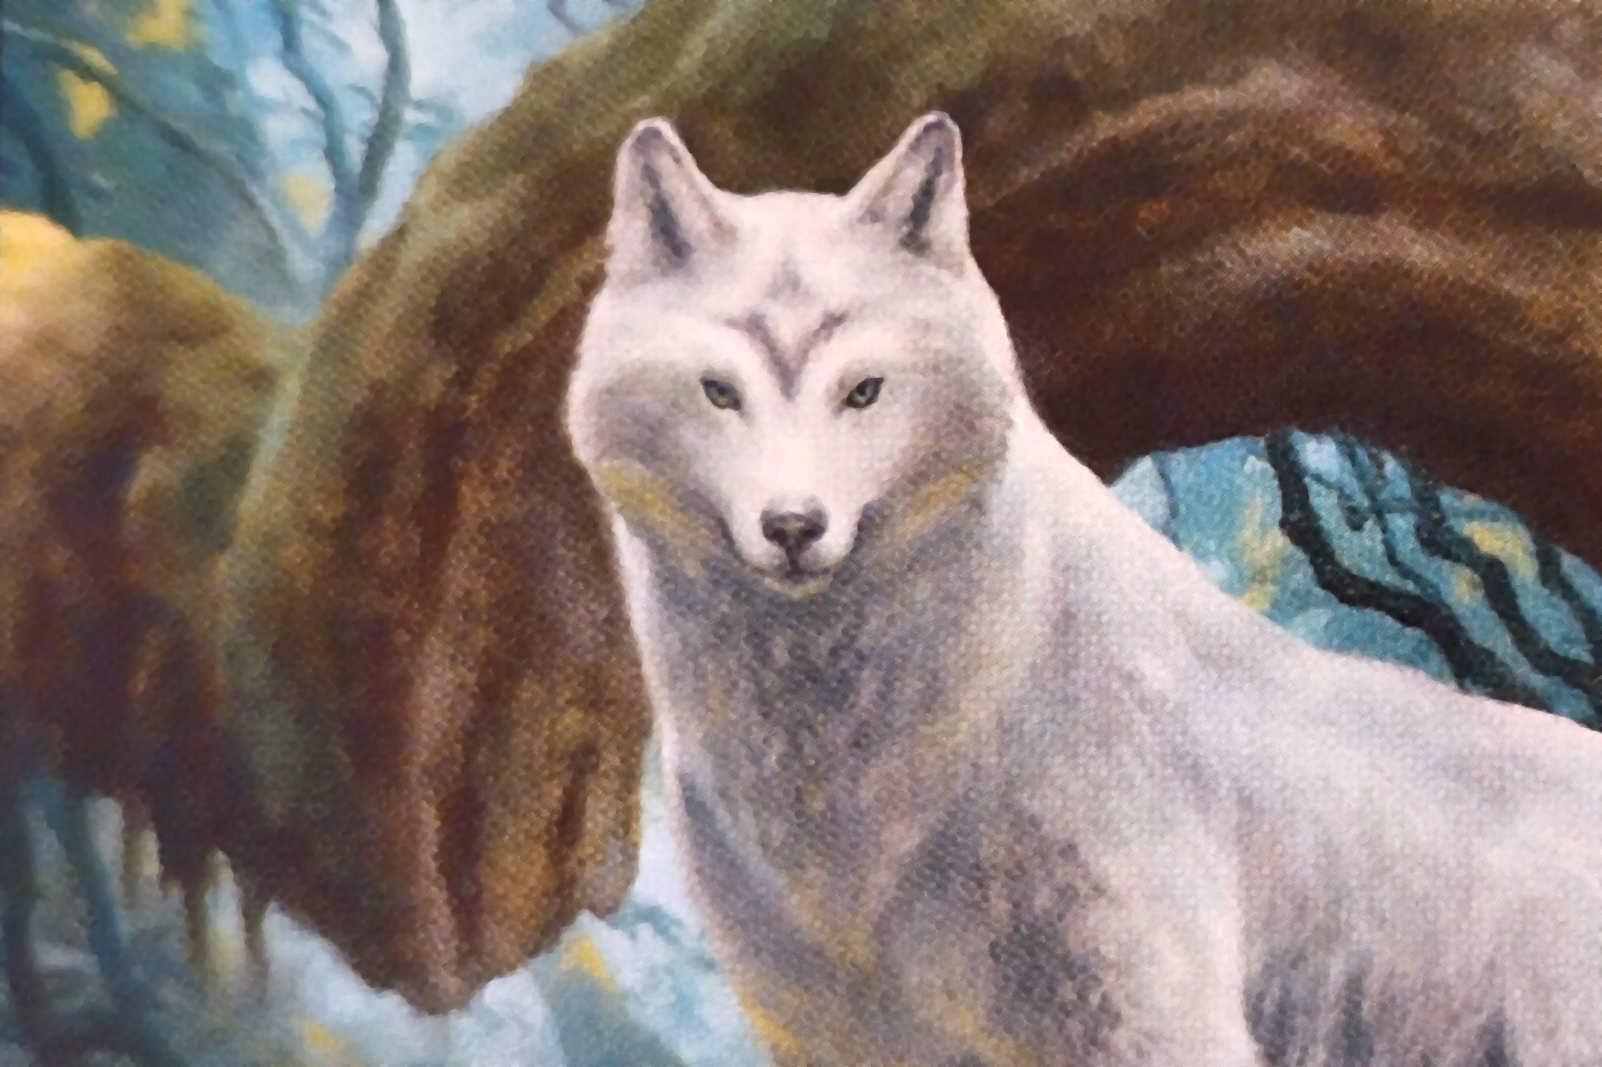 MTG sacred Wolf illustraion Image wizards of the coast, illustration by matt stewart